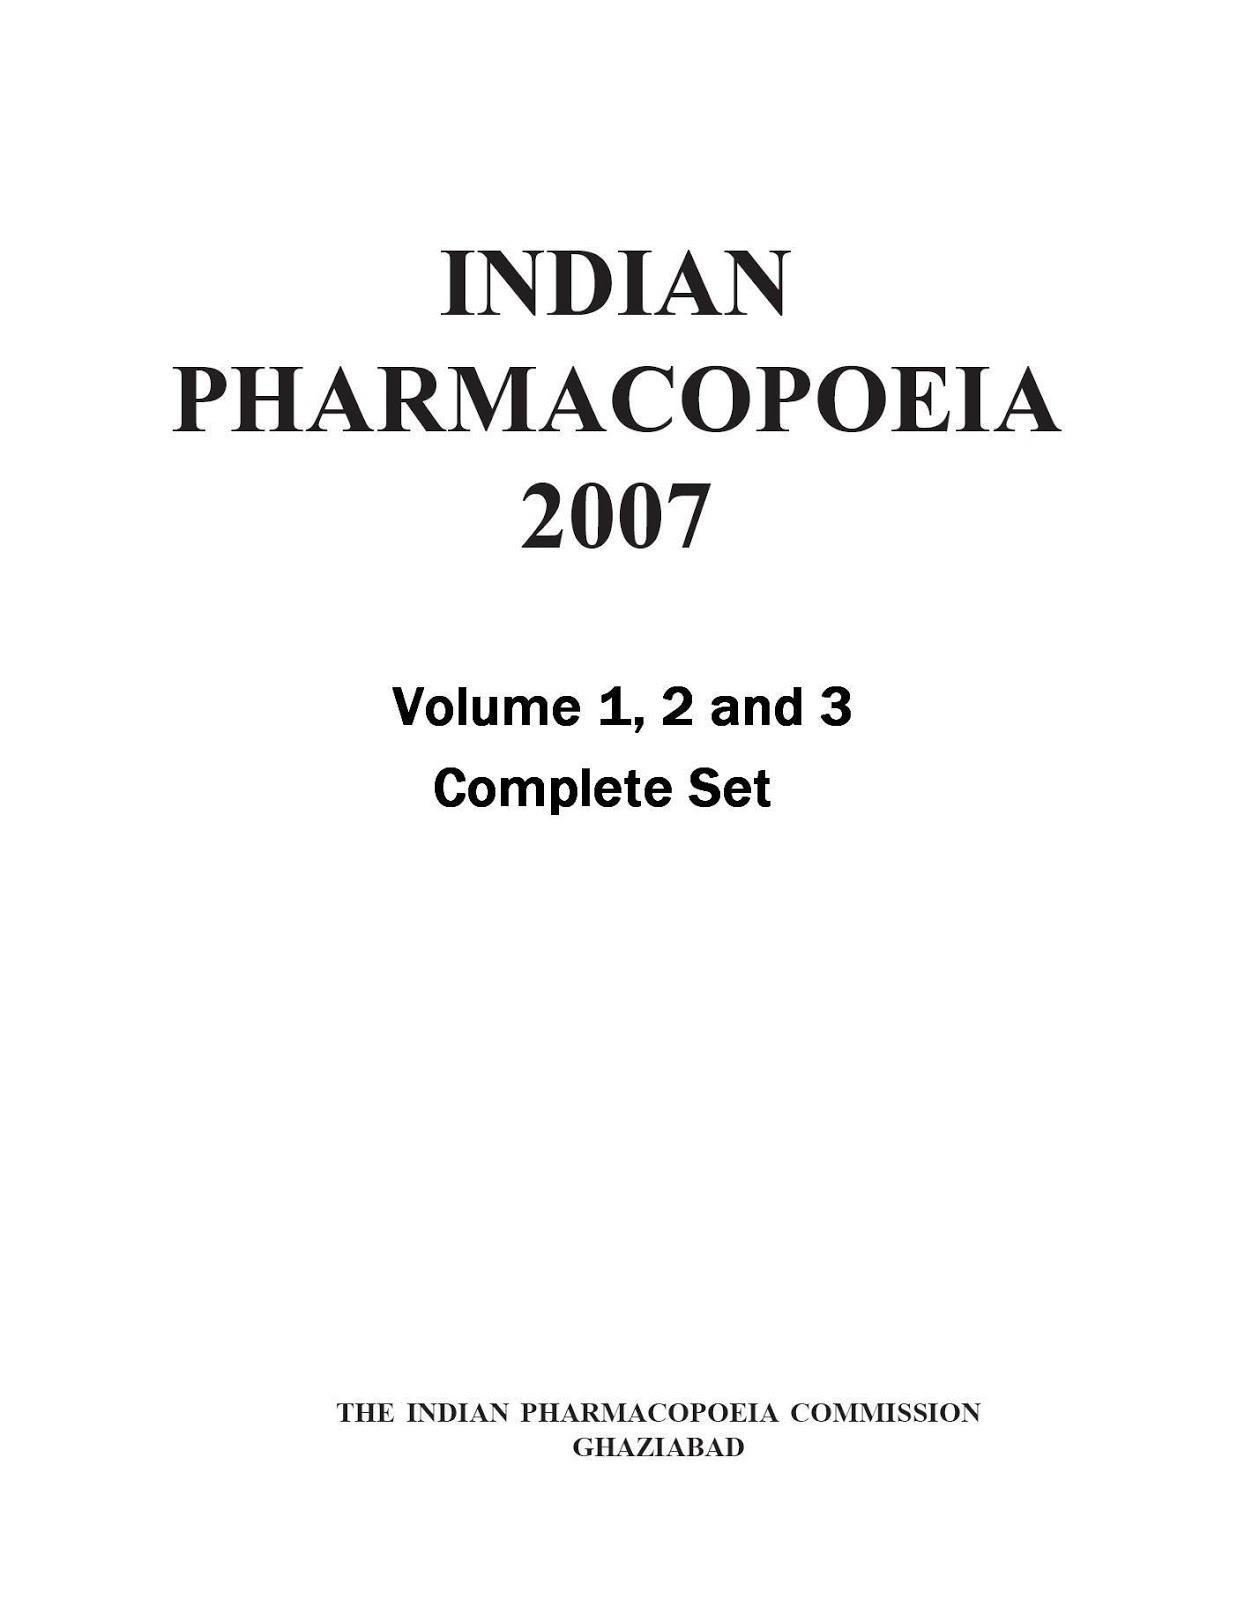 Book Of Indian Pharmacopoeia